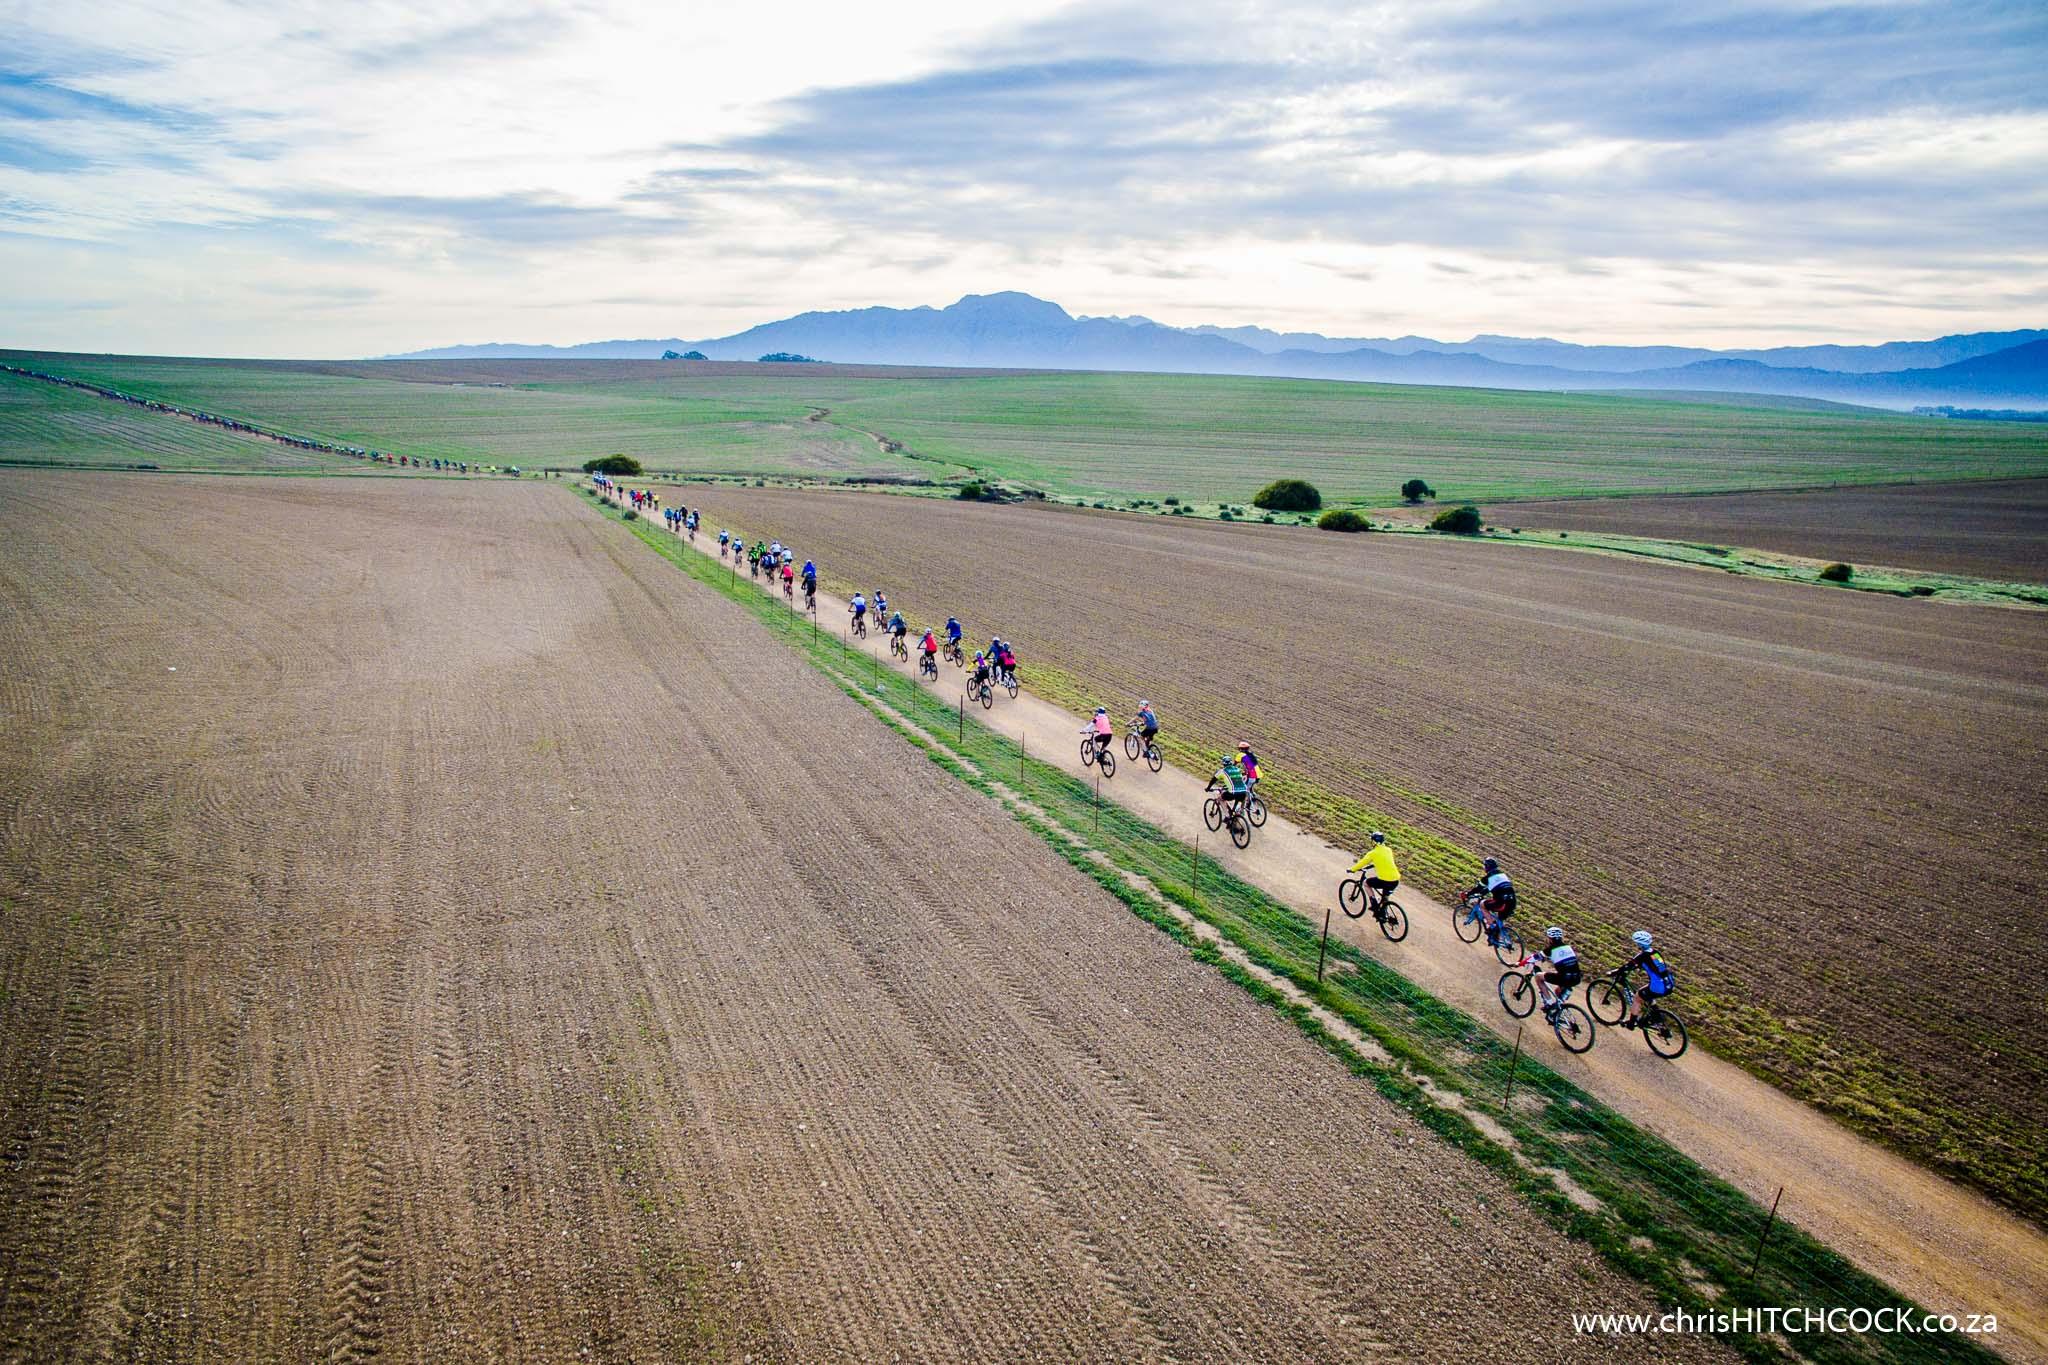 AmaRider 100 mtb mountain bike race.